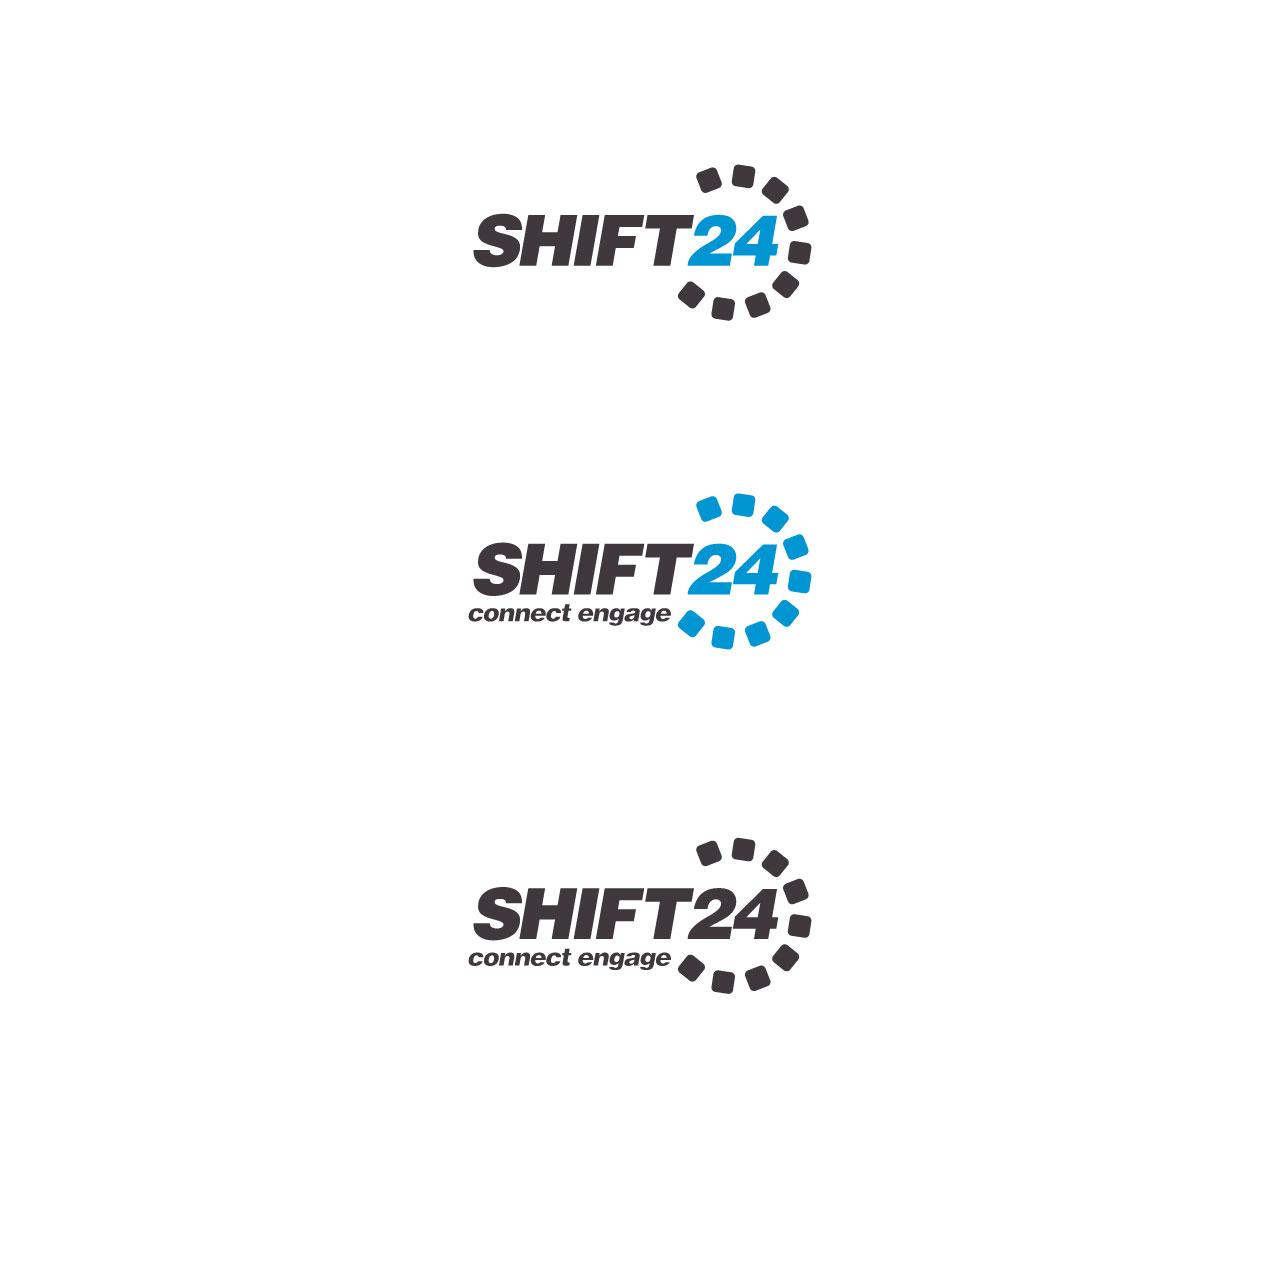 modern upmarket marketing logo design for shift24 by sdtm design